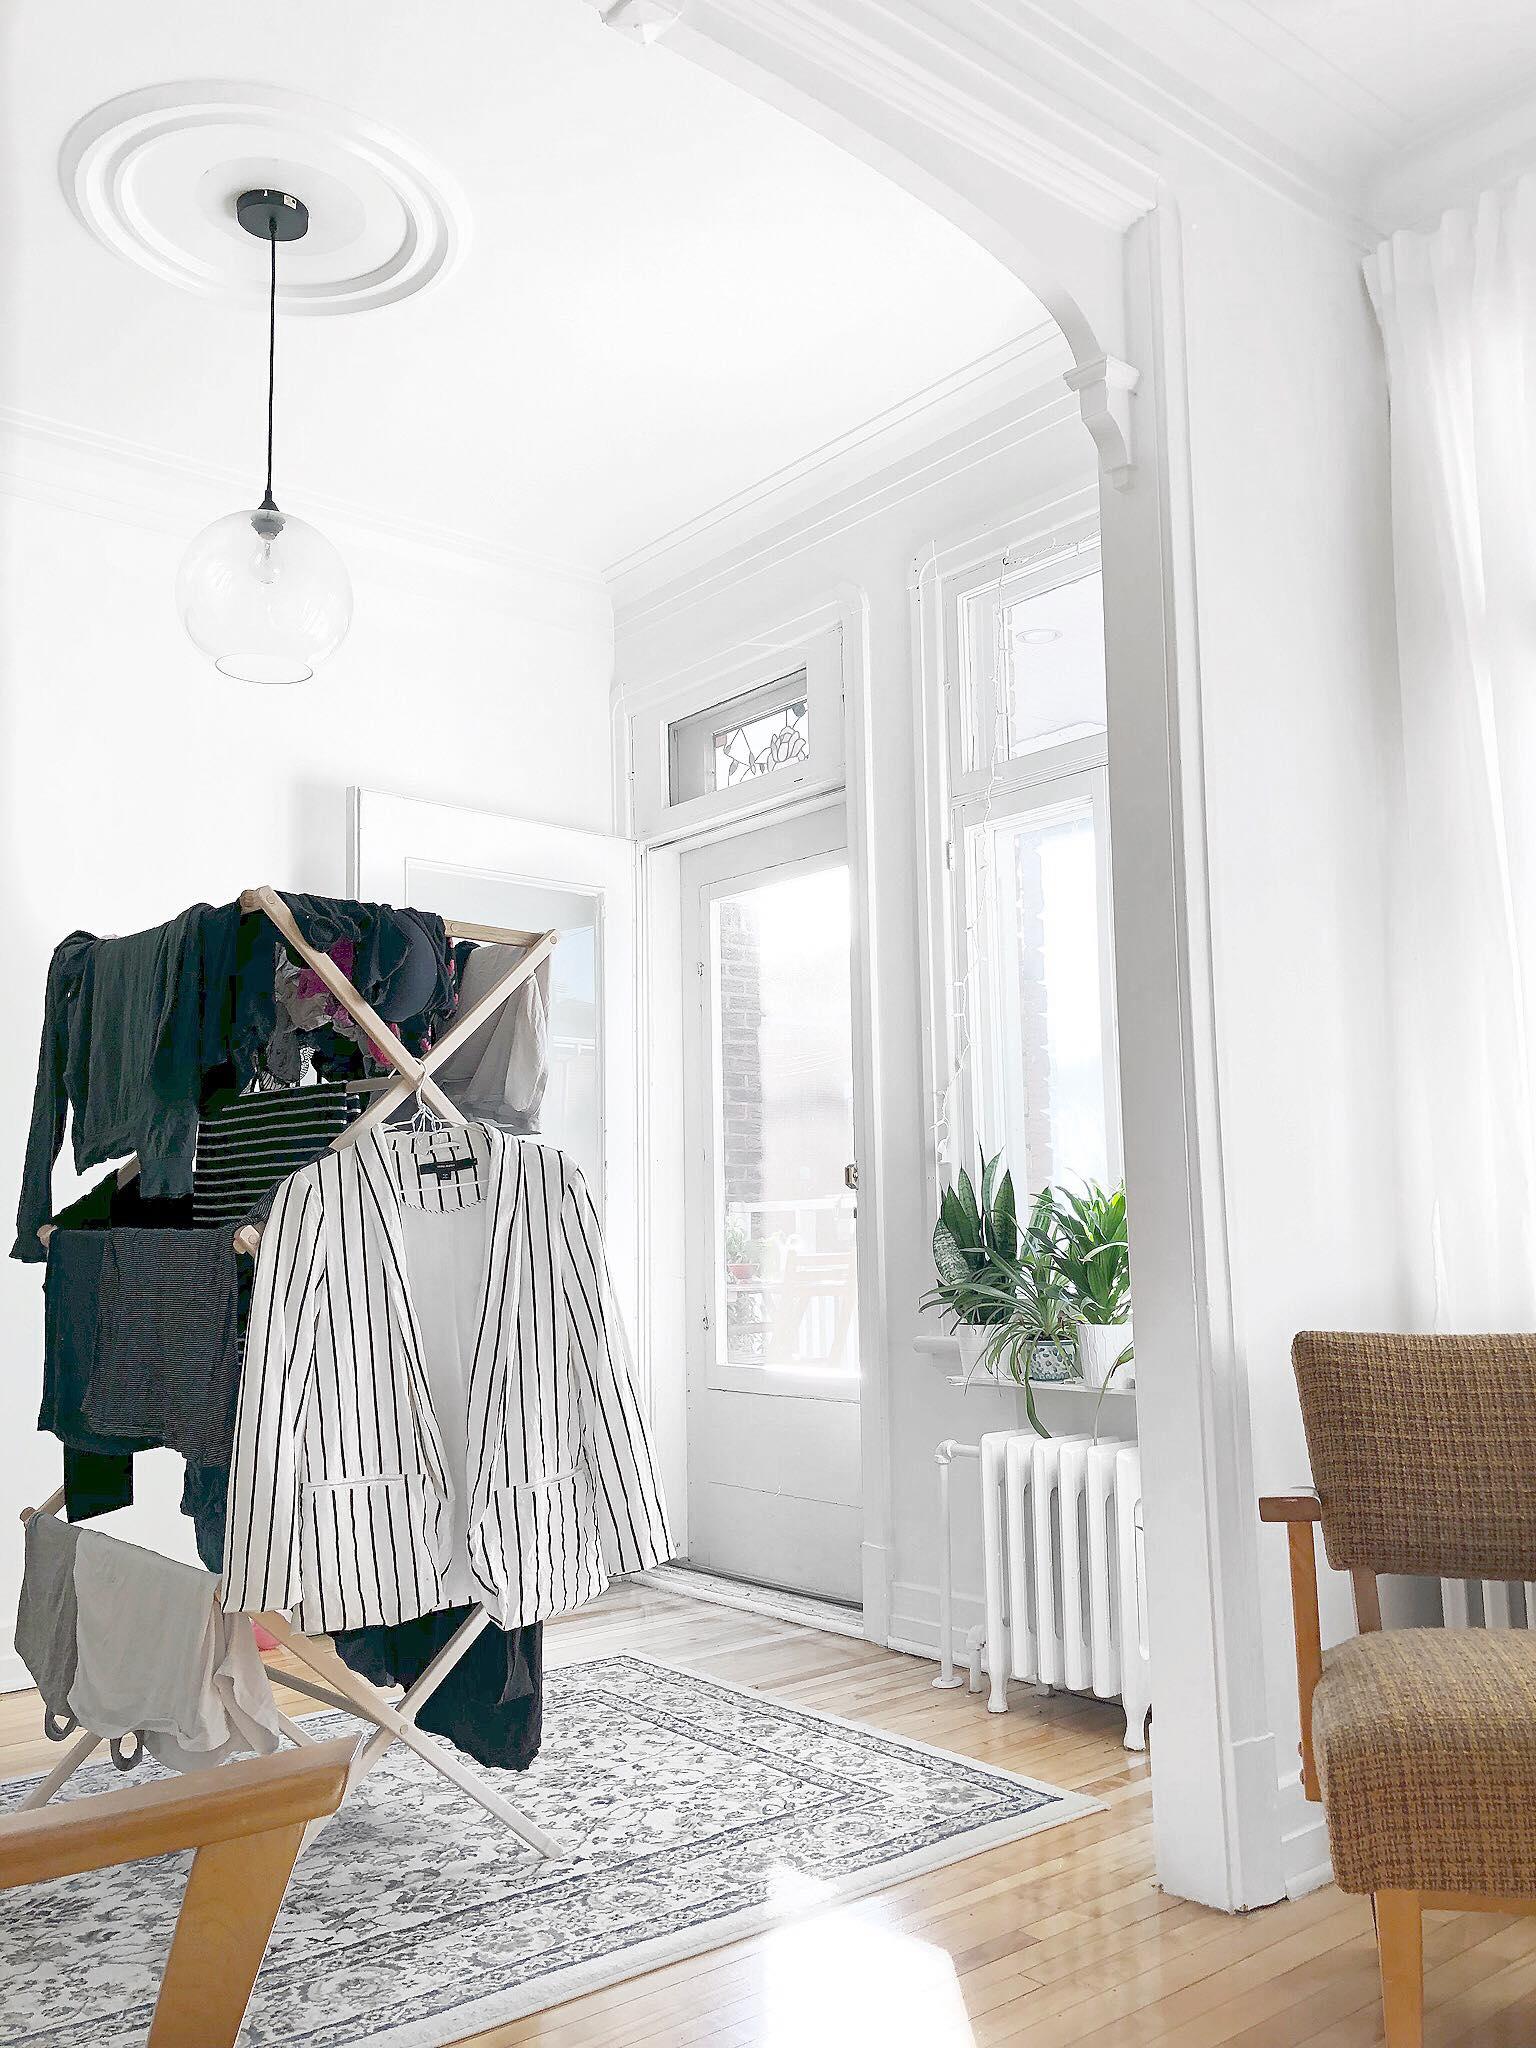 dimanche m nage vivre avec moins. Black Bedroom Furniture Sets. Home Design Ideas